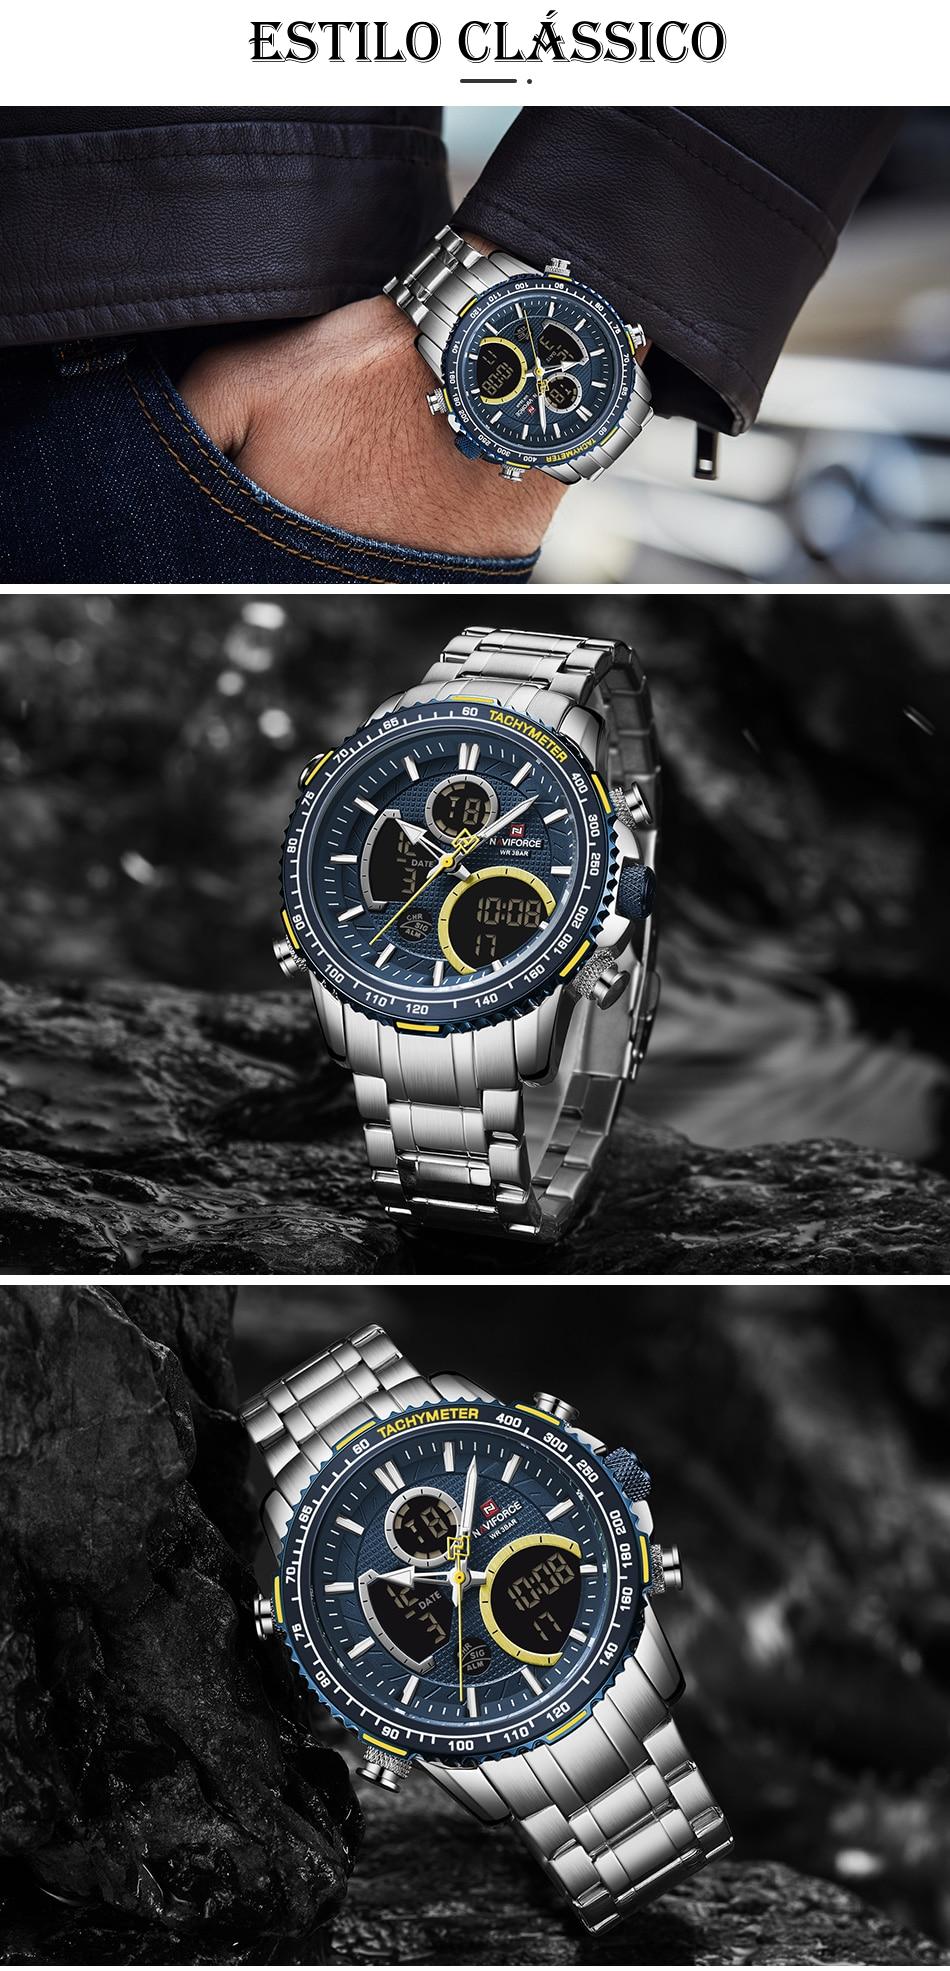 Relógio Naviforce NF9182 Clássico 6